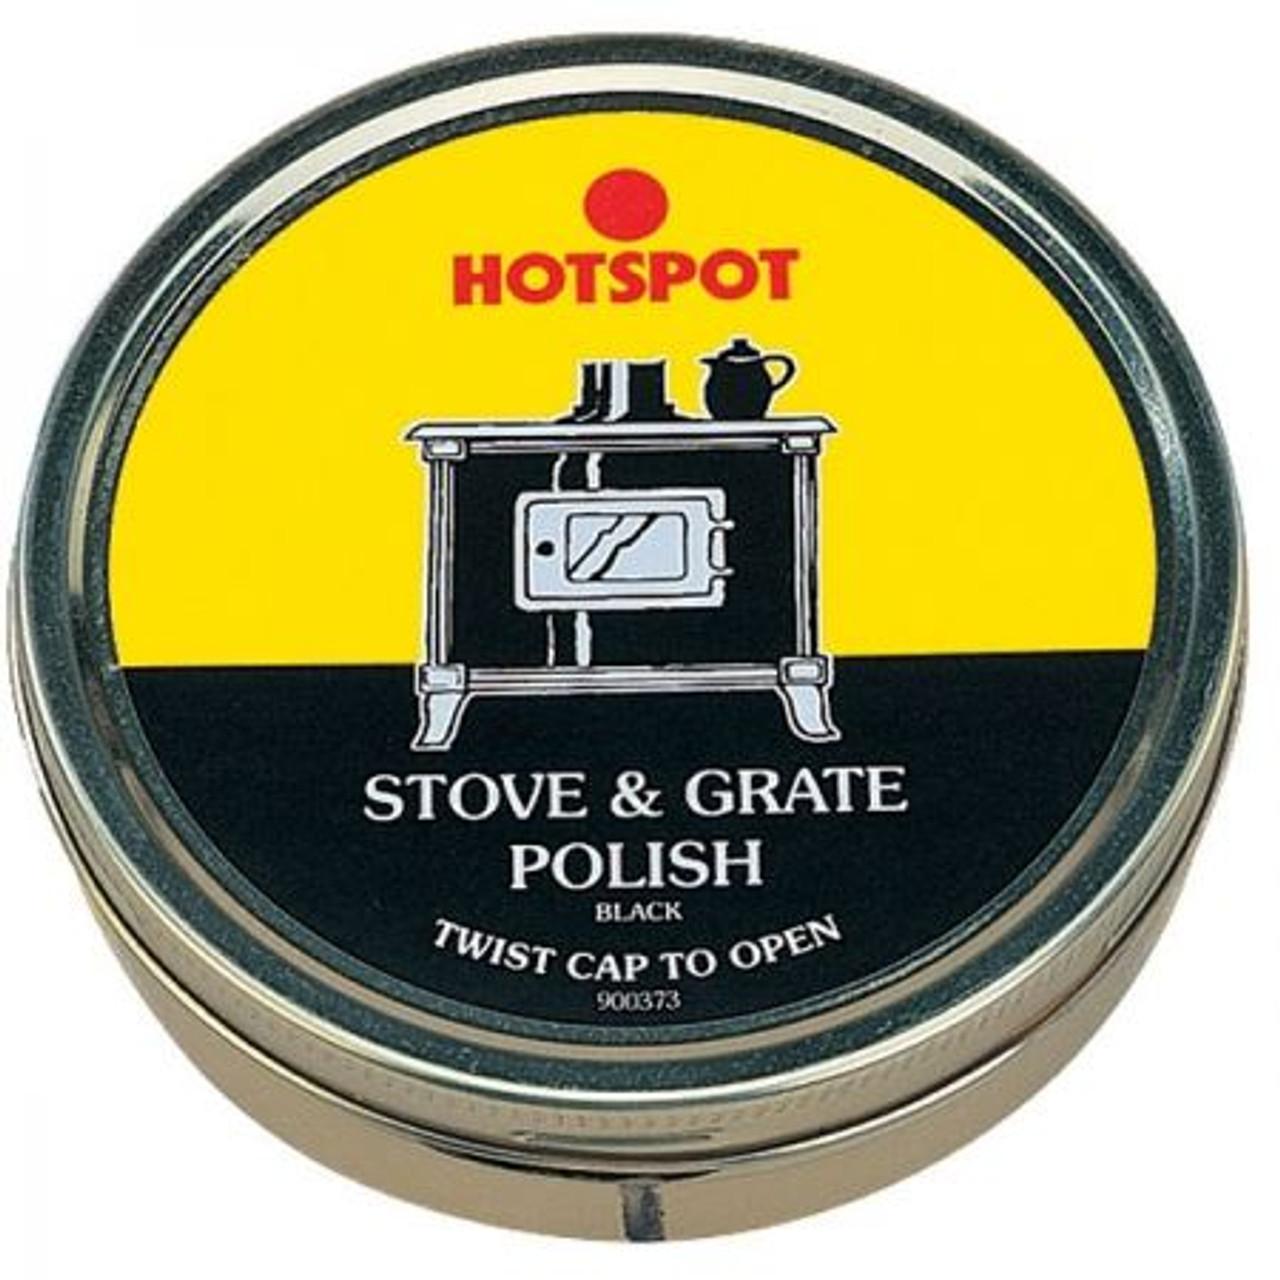 Manor Hotspot Stove & Grate Polish